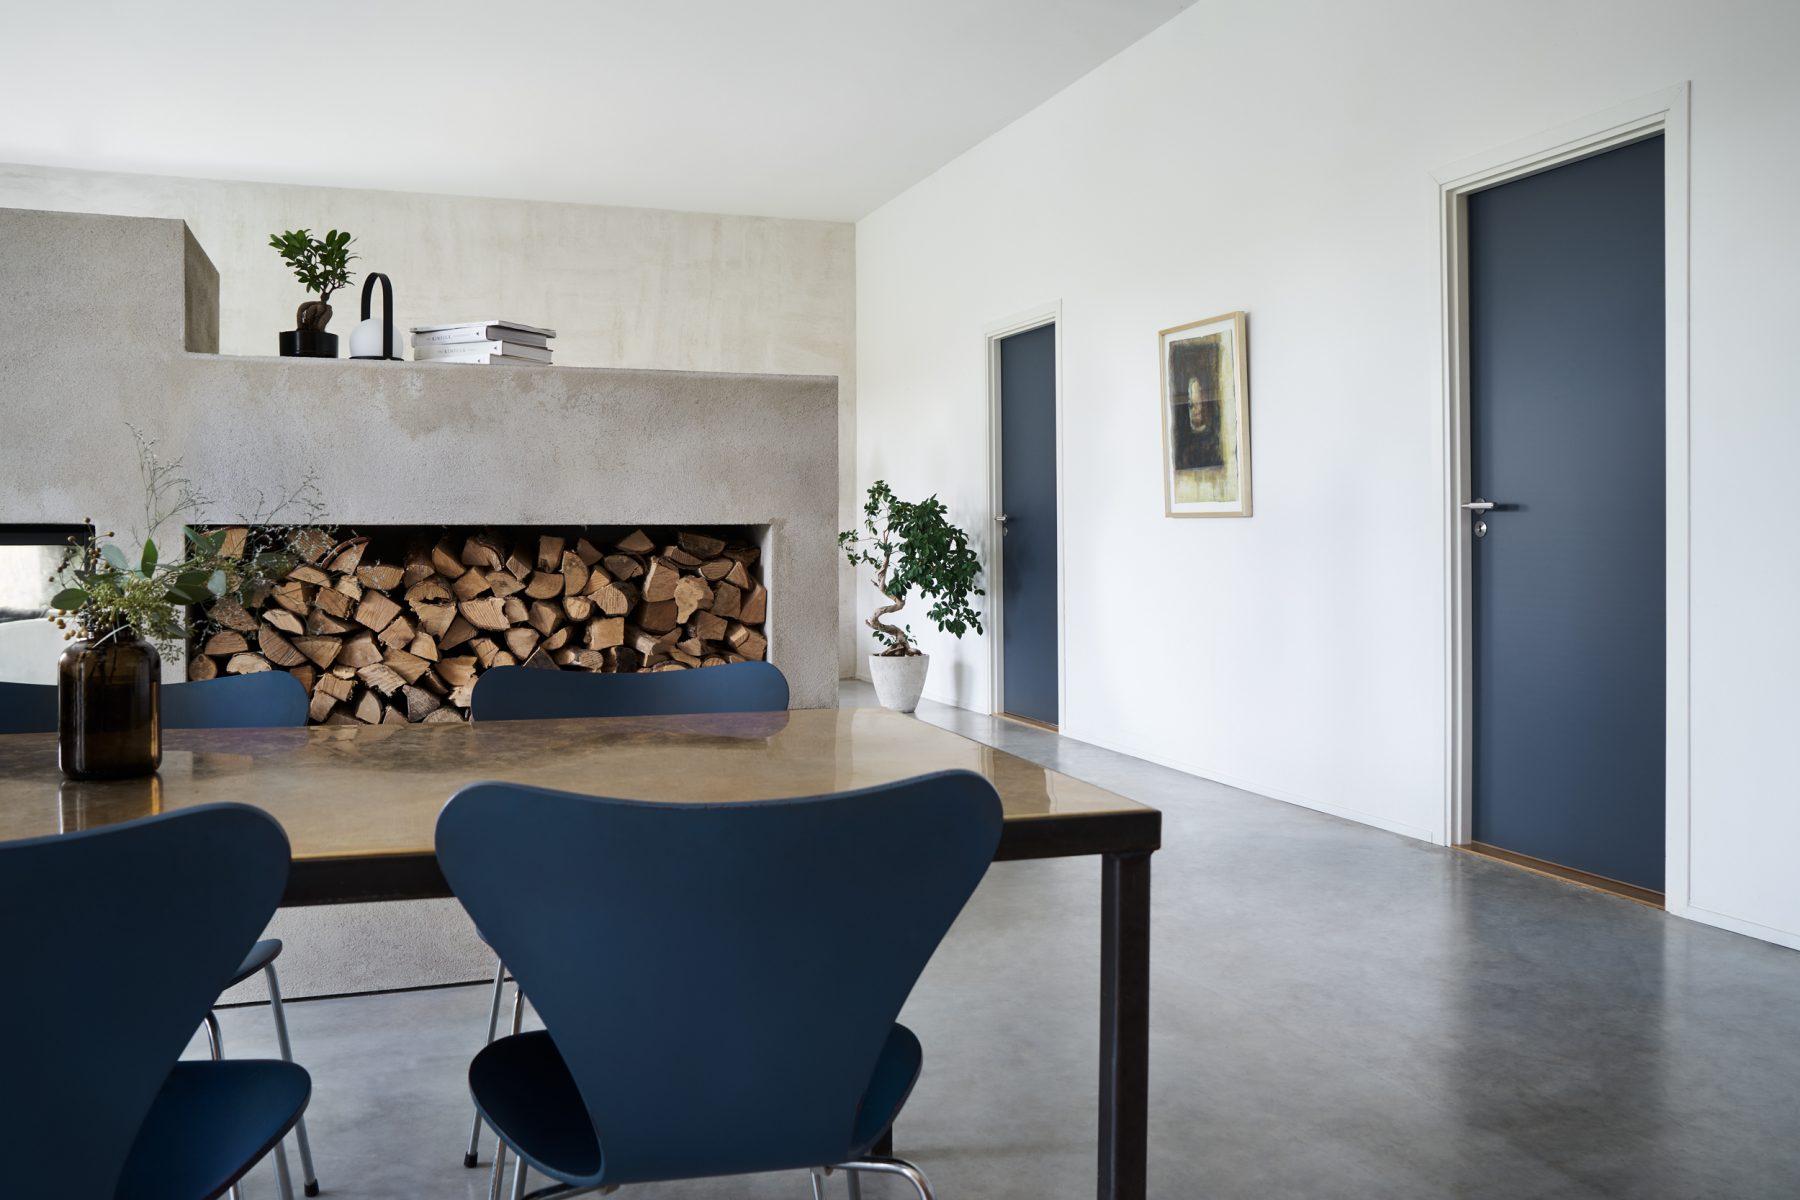 innerdörr-inredning-matbord-blå-fritz-hansen-buster-punch-njord